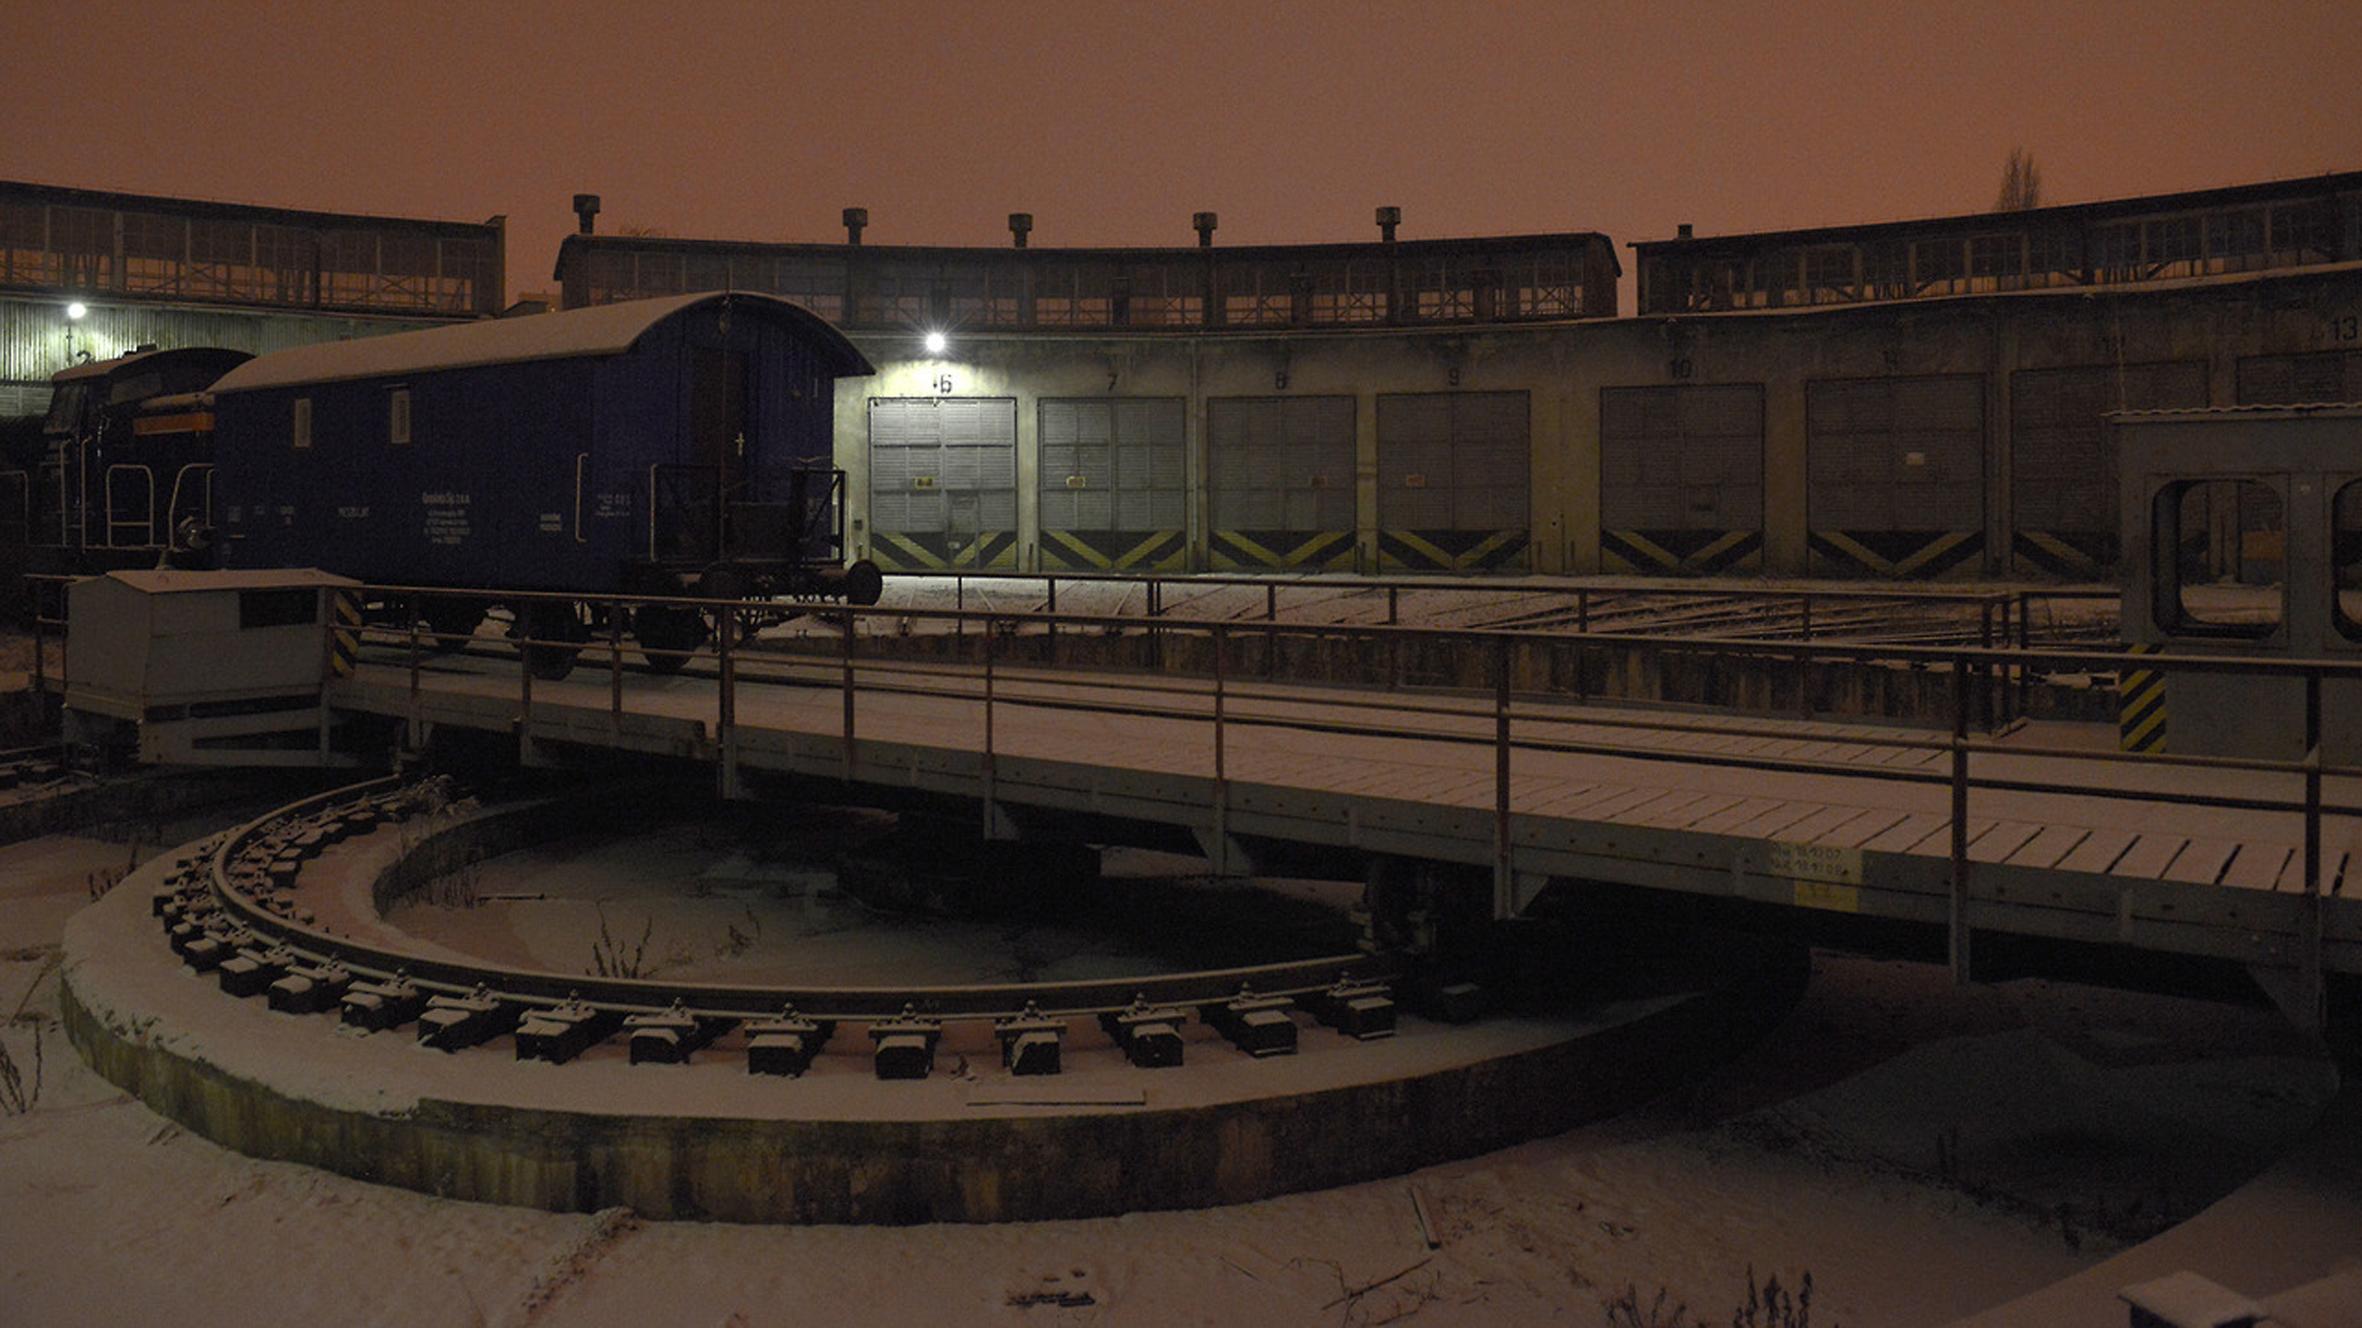 Lokomotywownia train depot